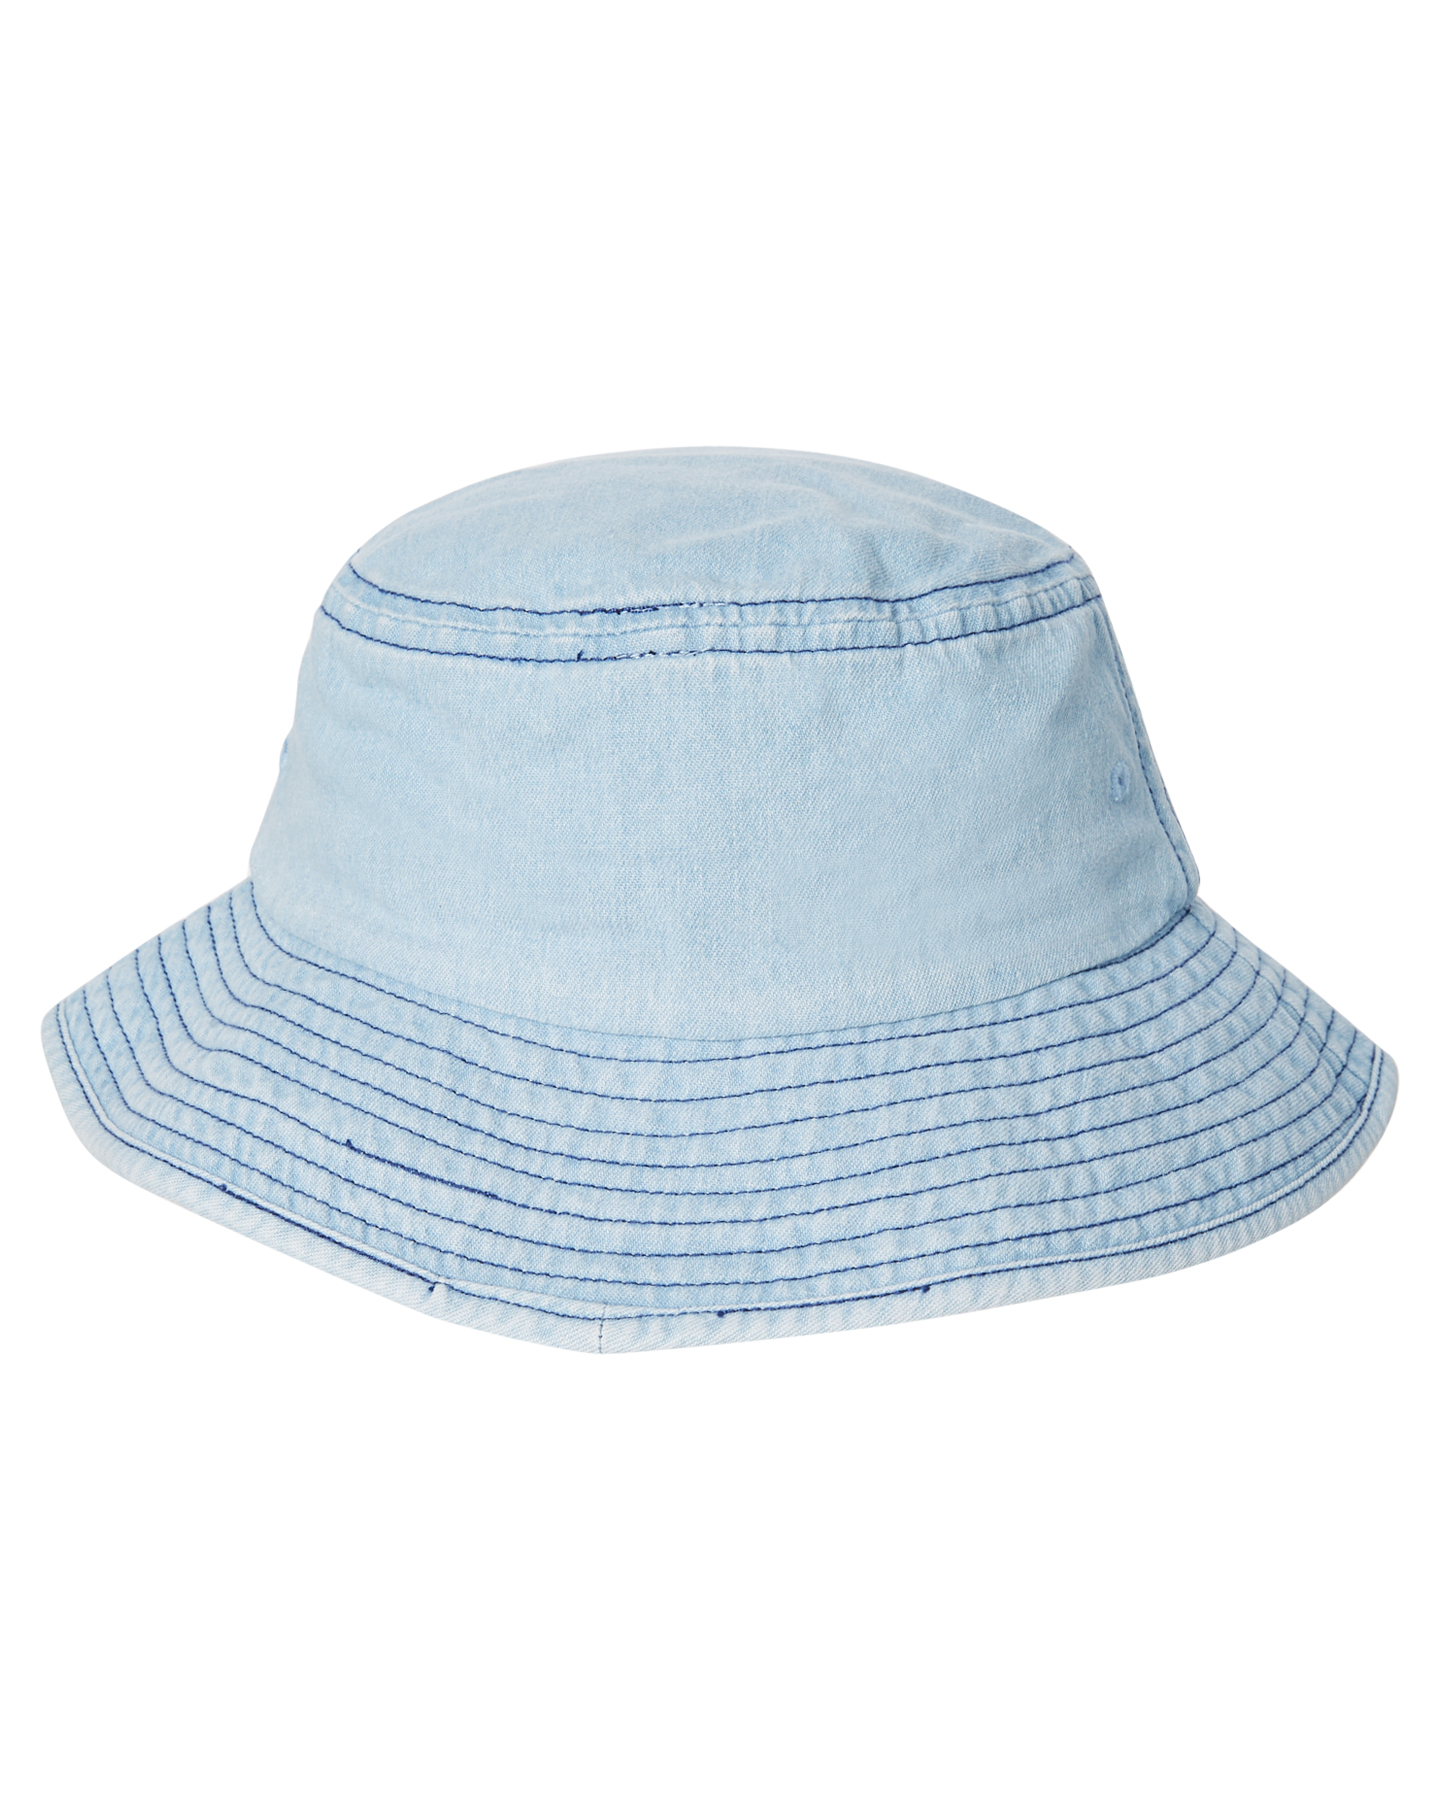 Ebay Billabong Sun Hat Mens 48a92 23965